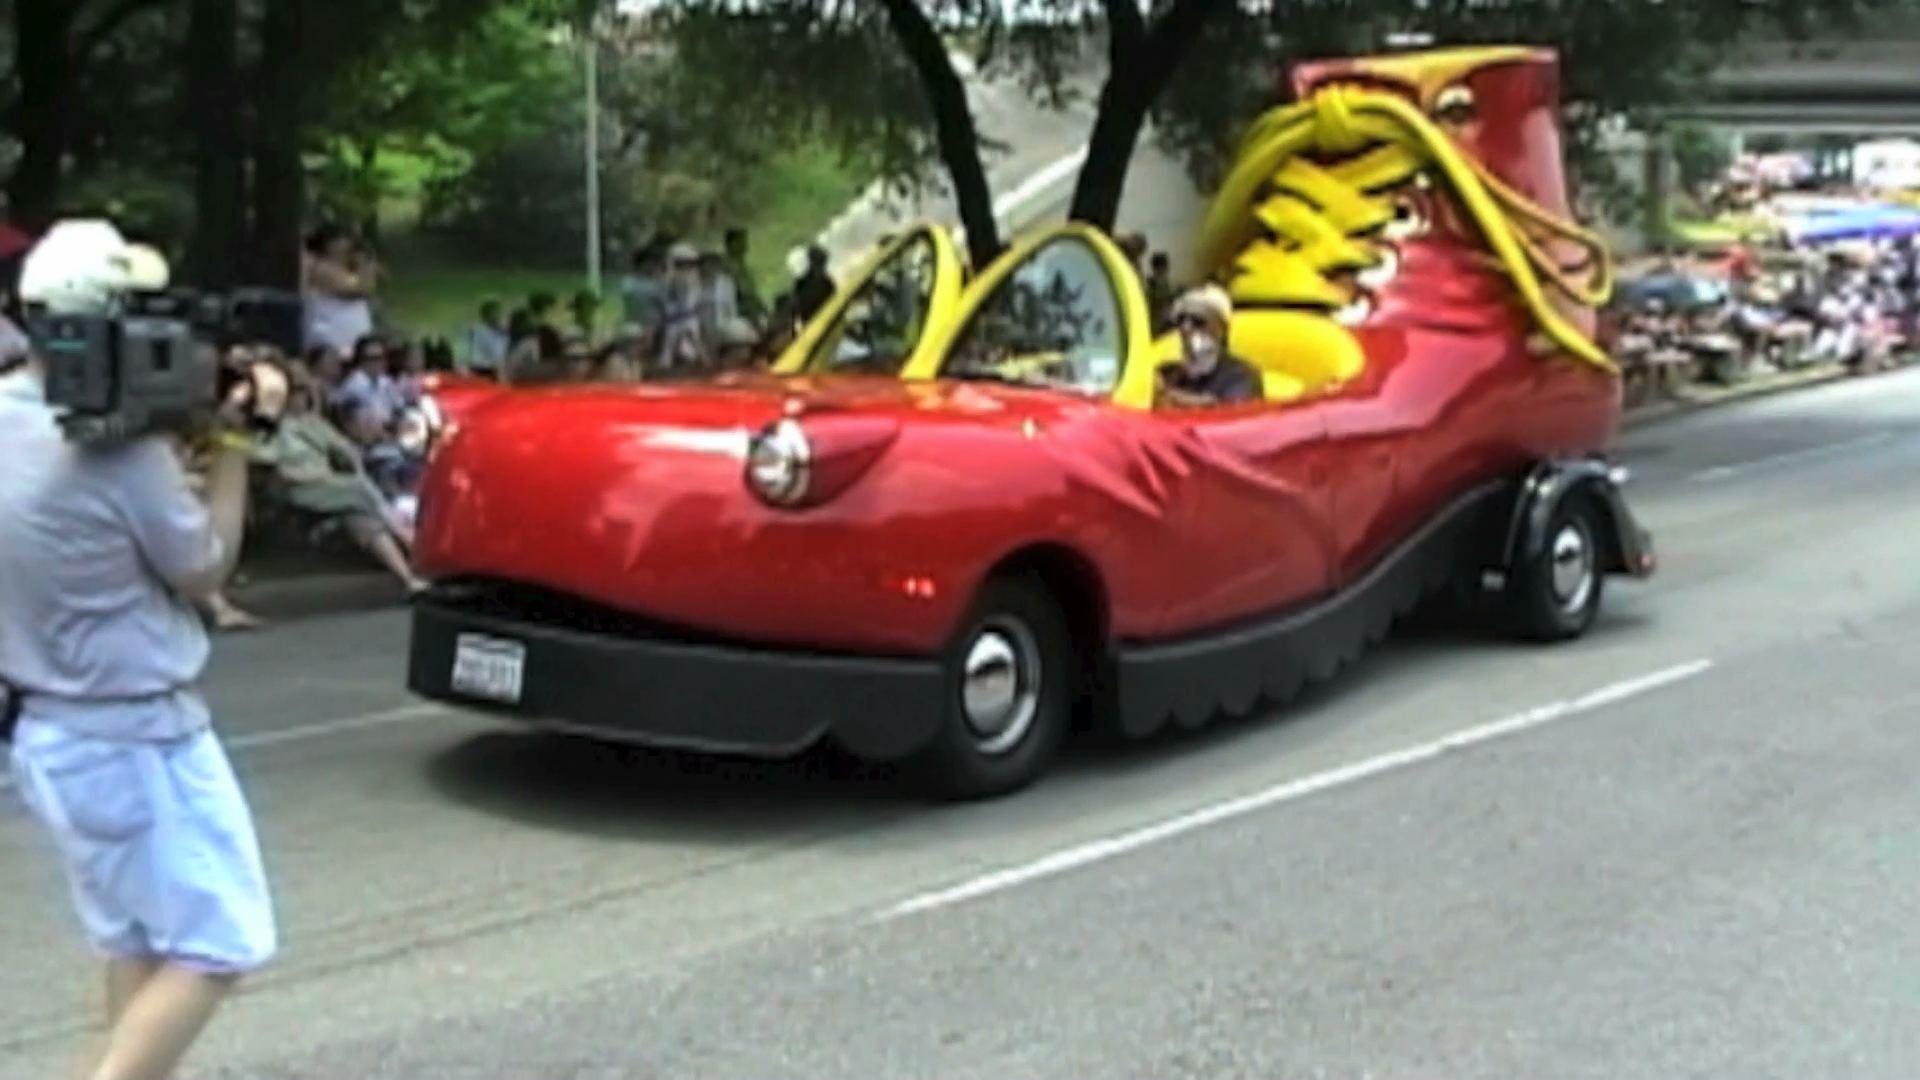 Houstons Art Car Parade Paul Michaels - Cool looking cars